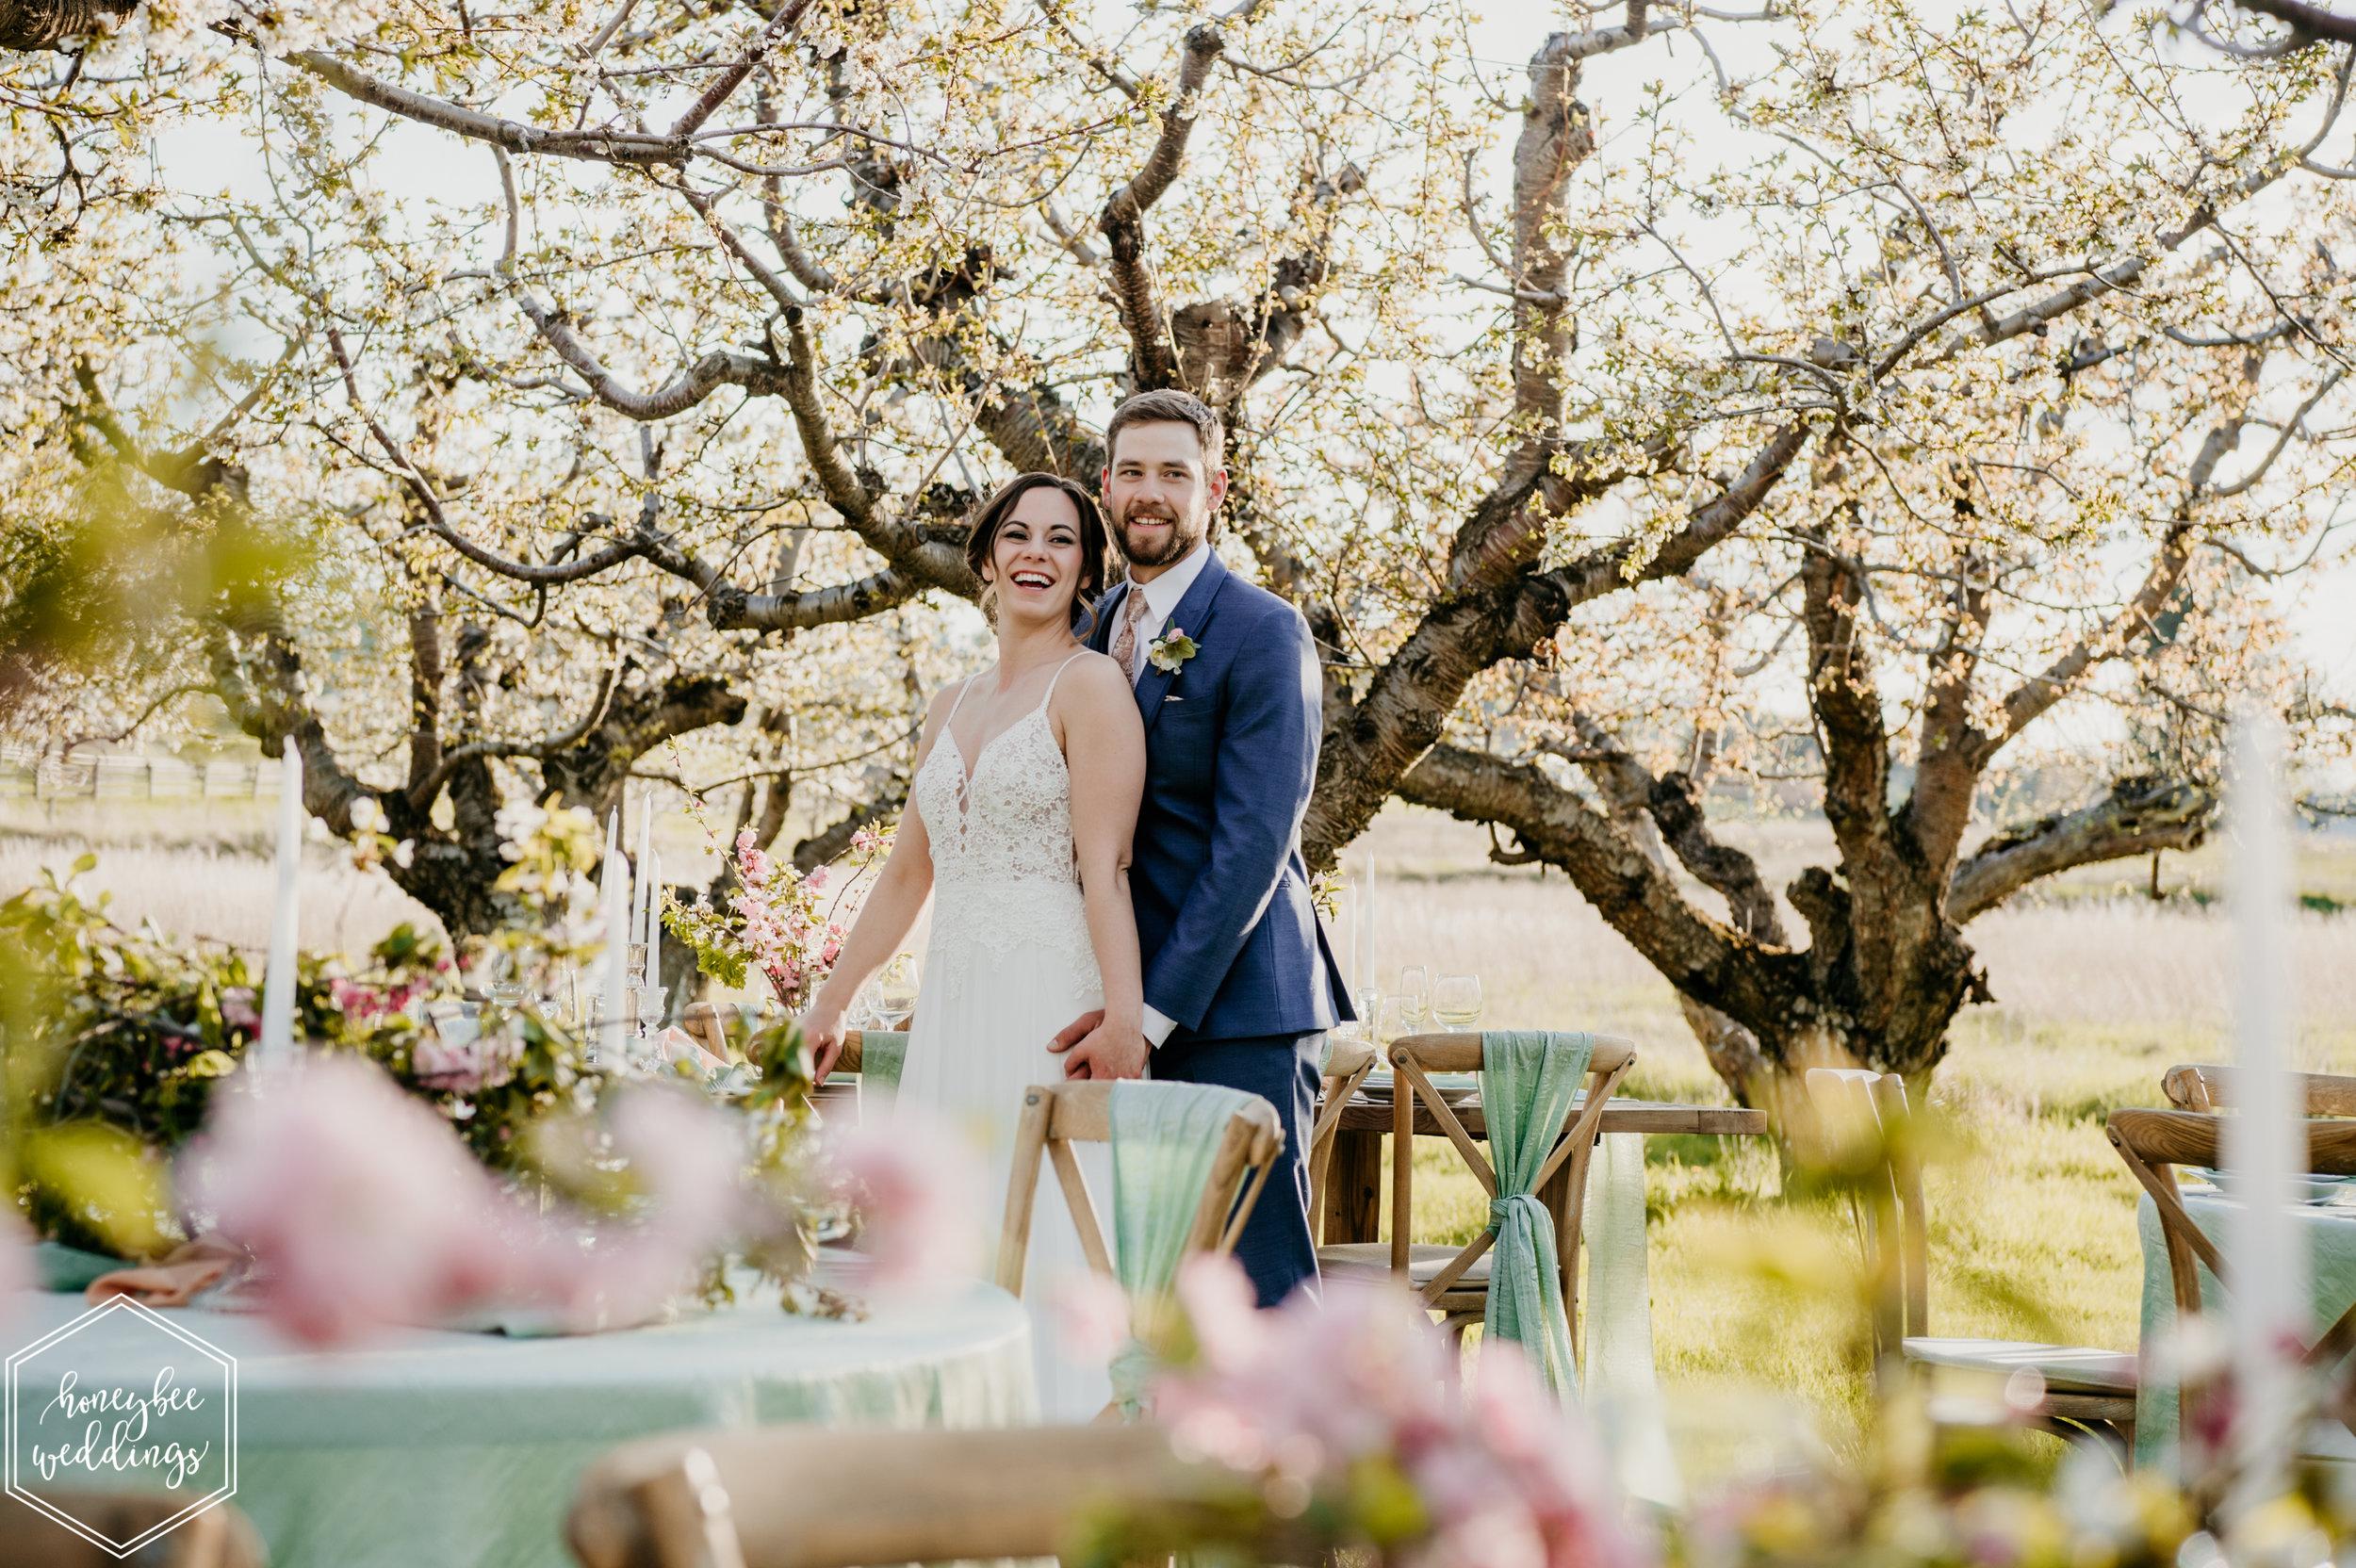 133Cherry Blossom Wedding_Styled Photoshoot_Honeybee Weddings_May 11, 2019-280.jpg